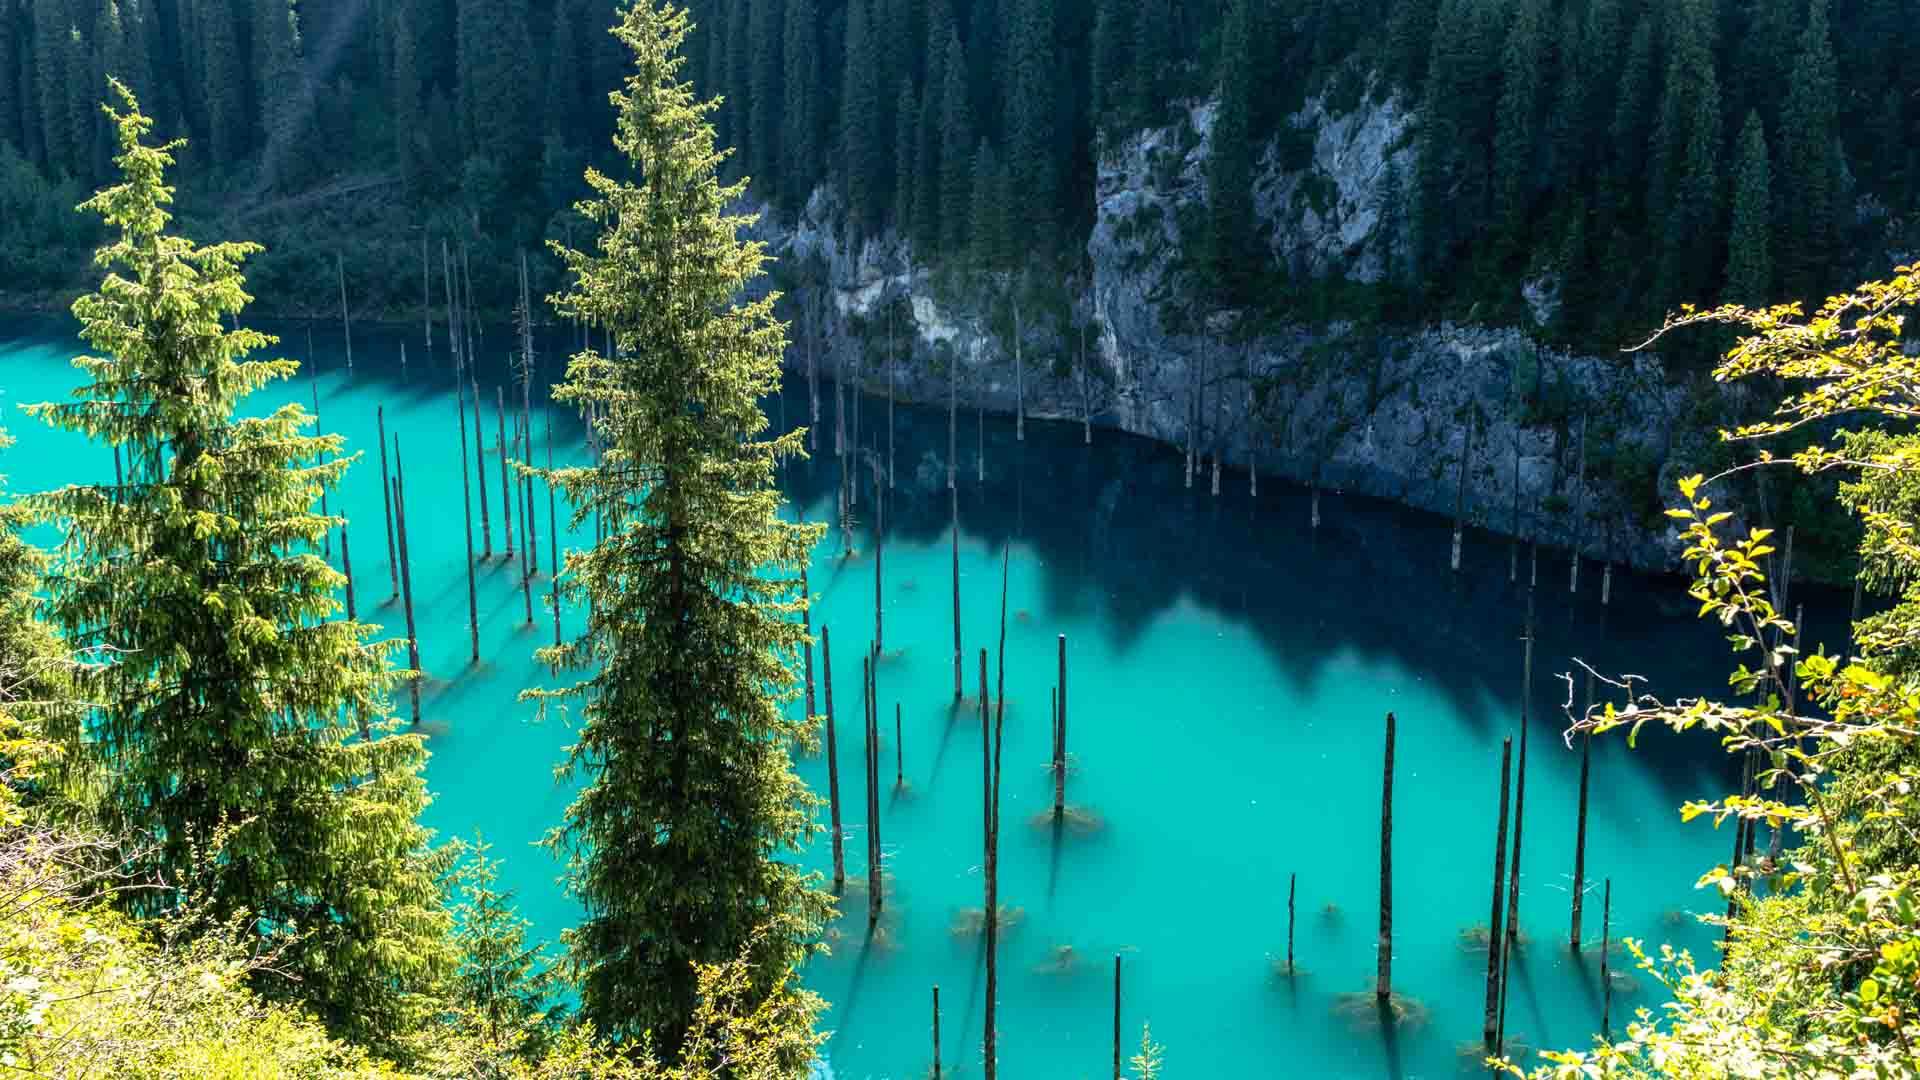 SerialHikers stop autostop world monde tour hitchhiking aventure adventure alternative travel voyage sans avion no fly Kazakhstan Kaindy Lake lac sunken forest forêt immergée camping